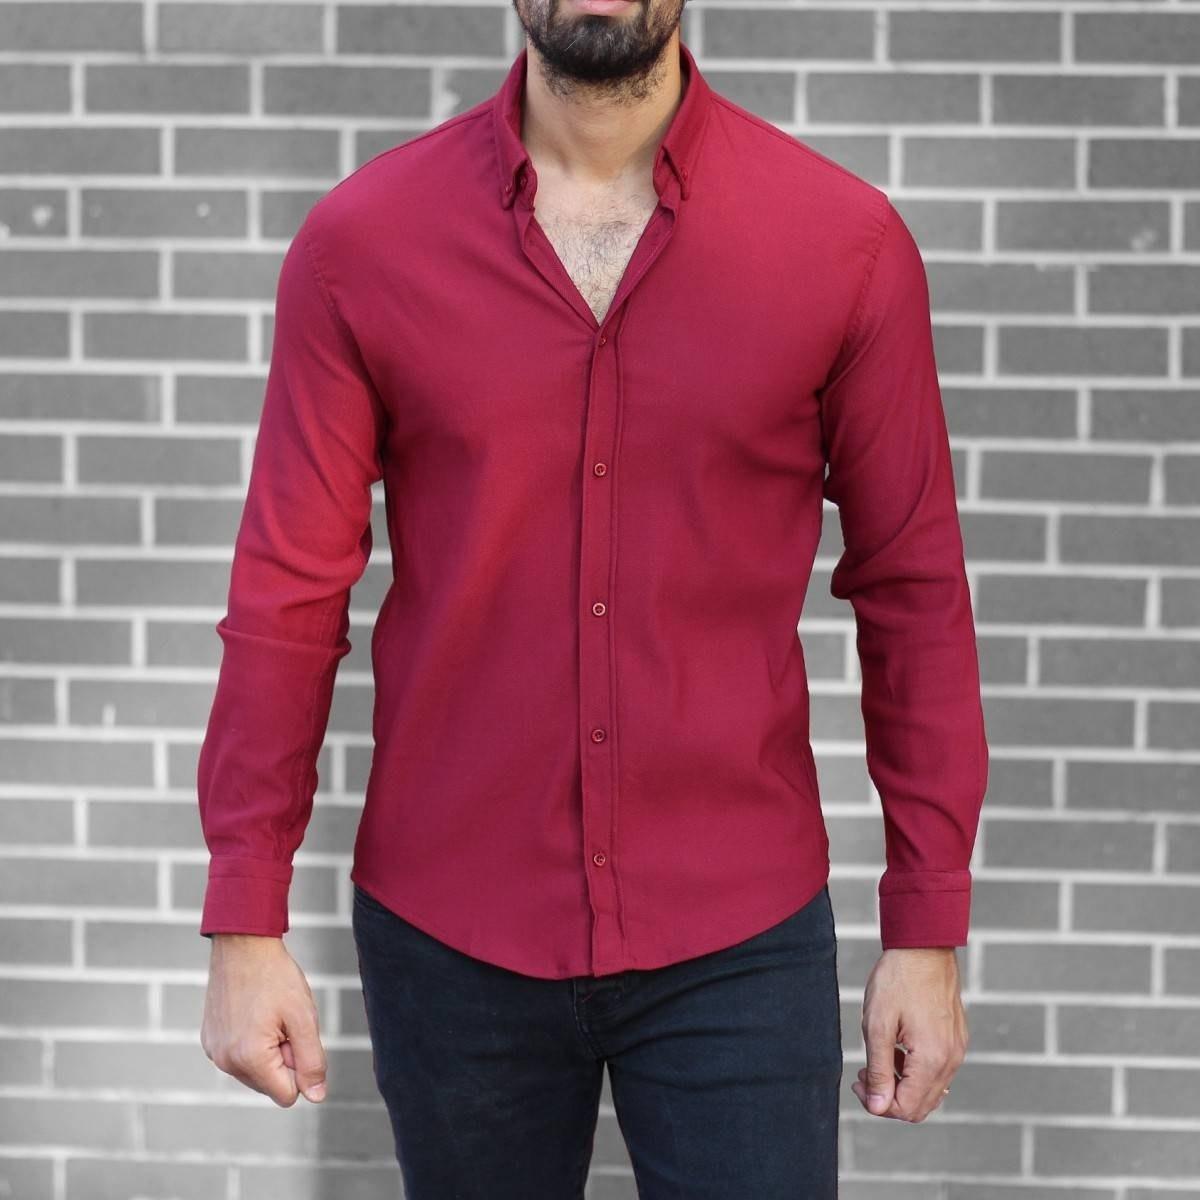 Men's Stylish Lycra Shirt In Red